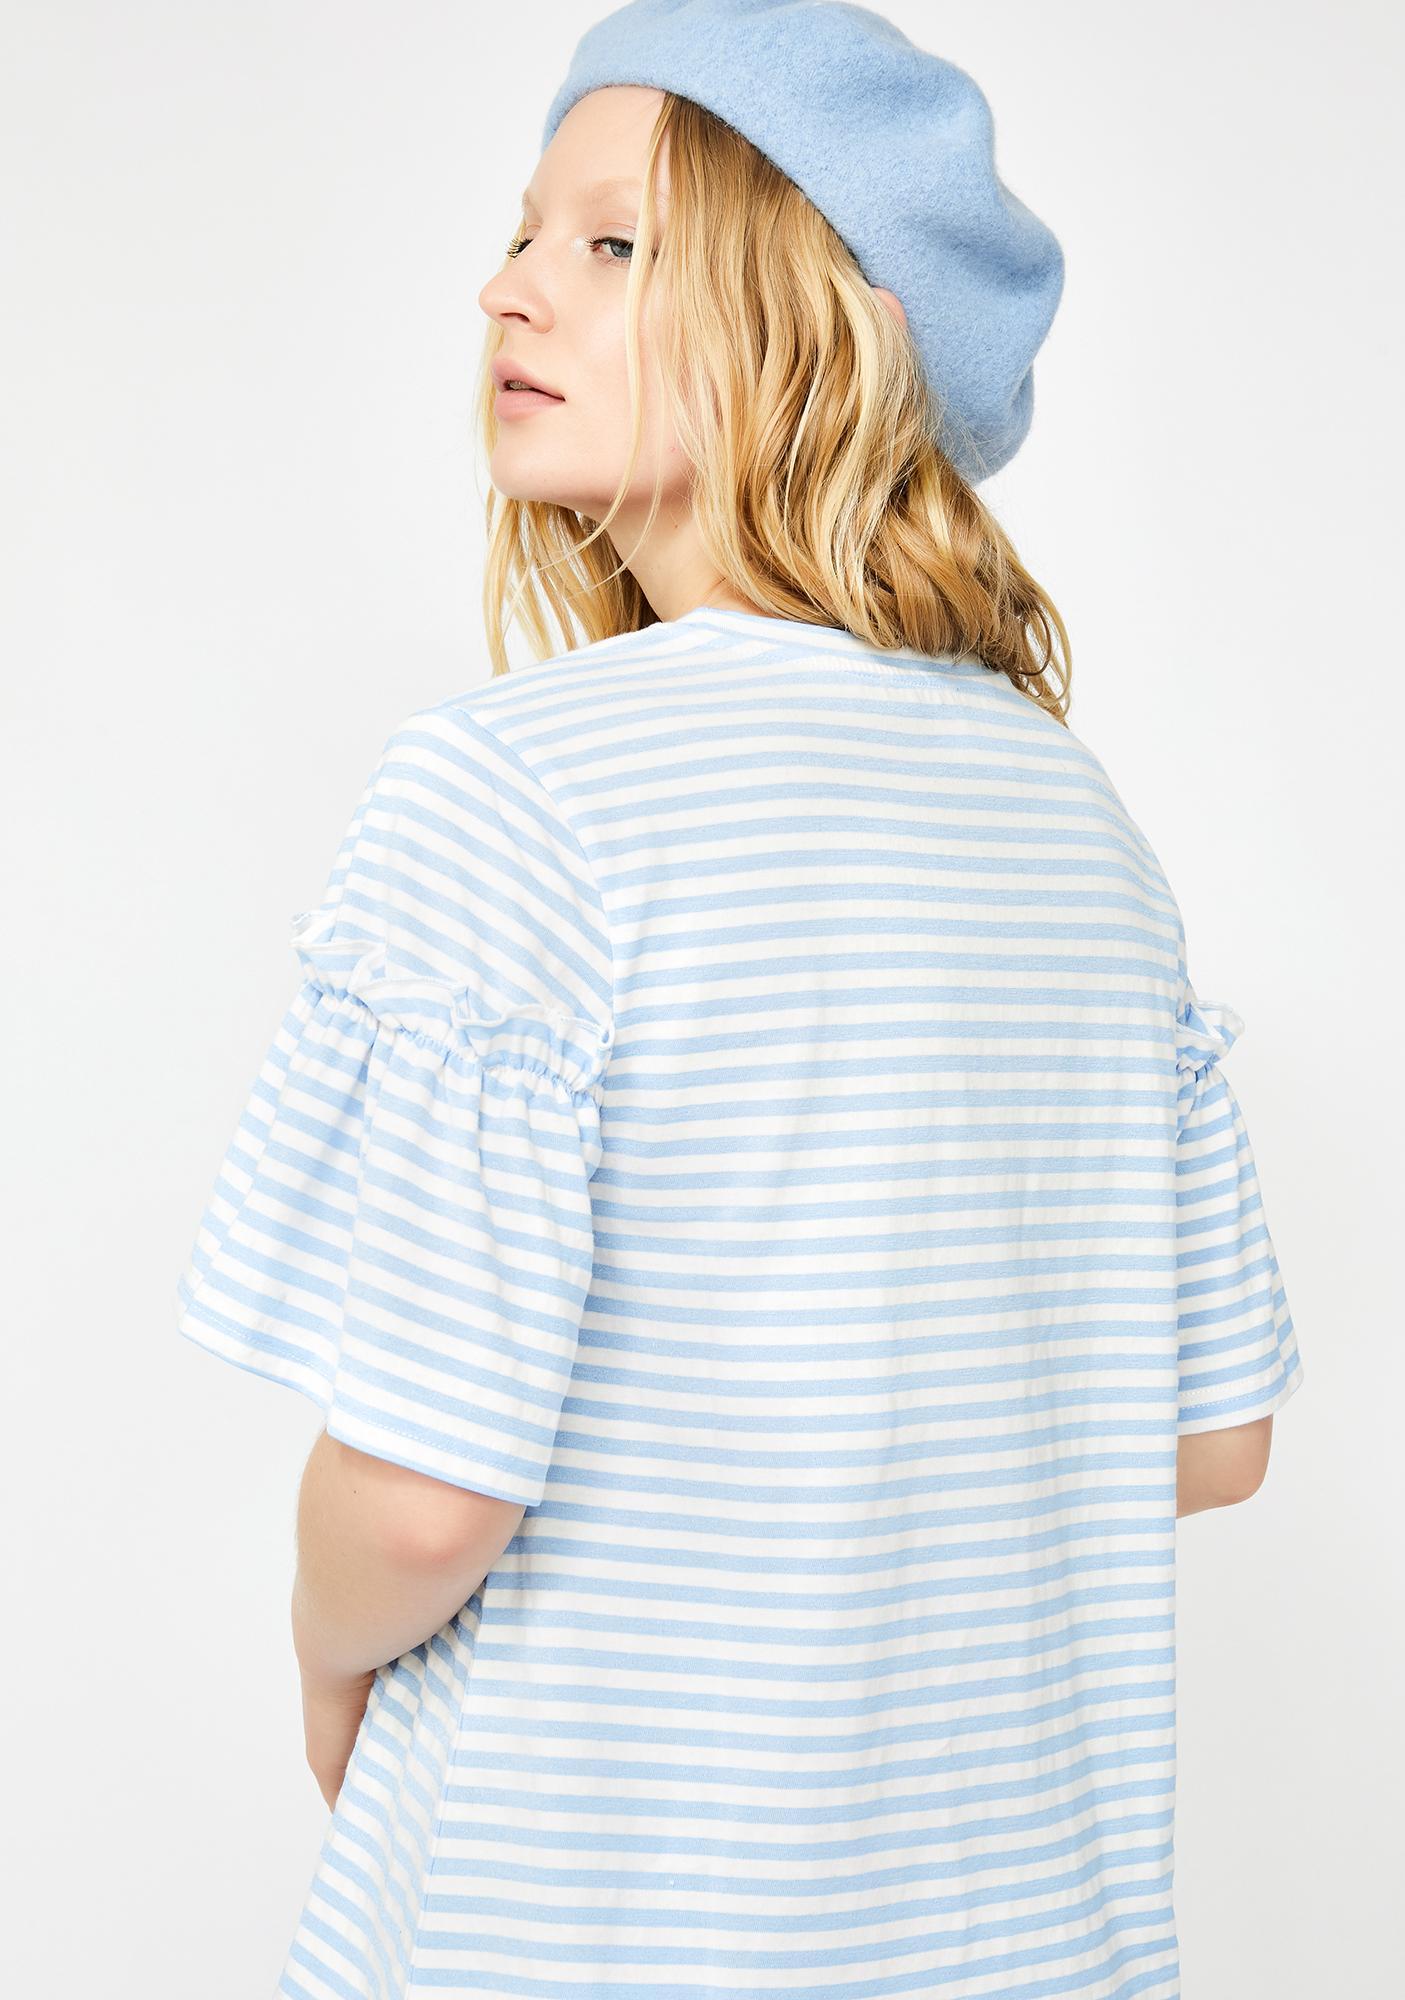 Soft Spot Striped Tee